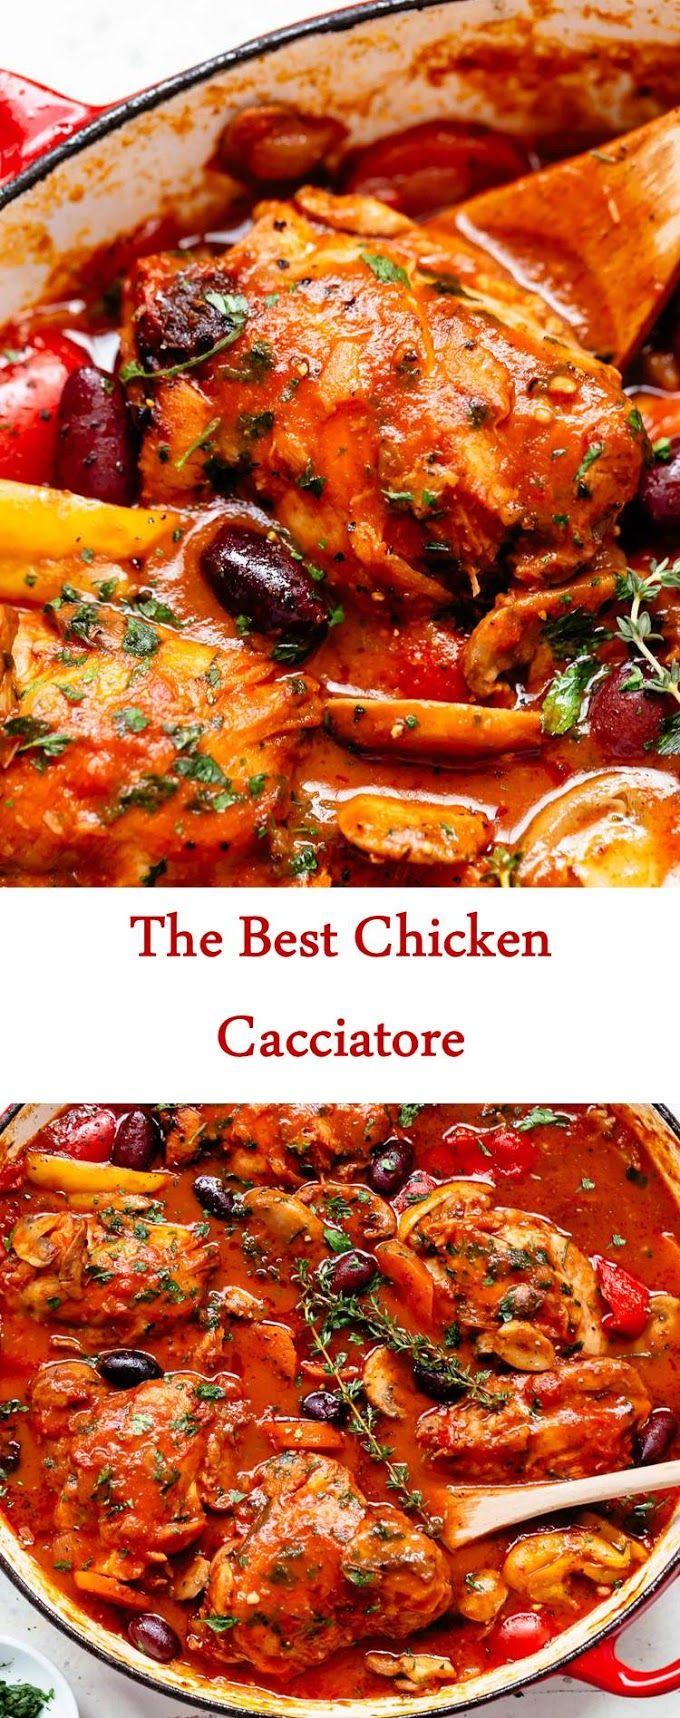 The Best Chicken Cacciatore Cacciatore Recipes Chicken Cacciatore Recipe Chicken Recipes